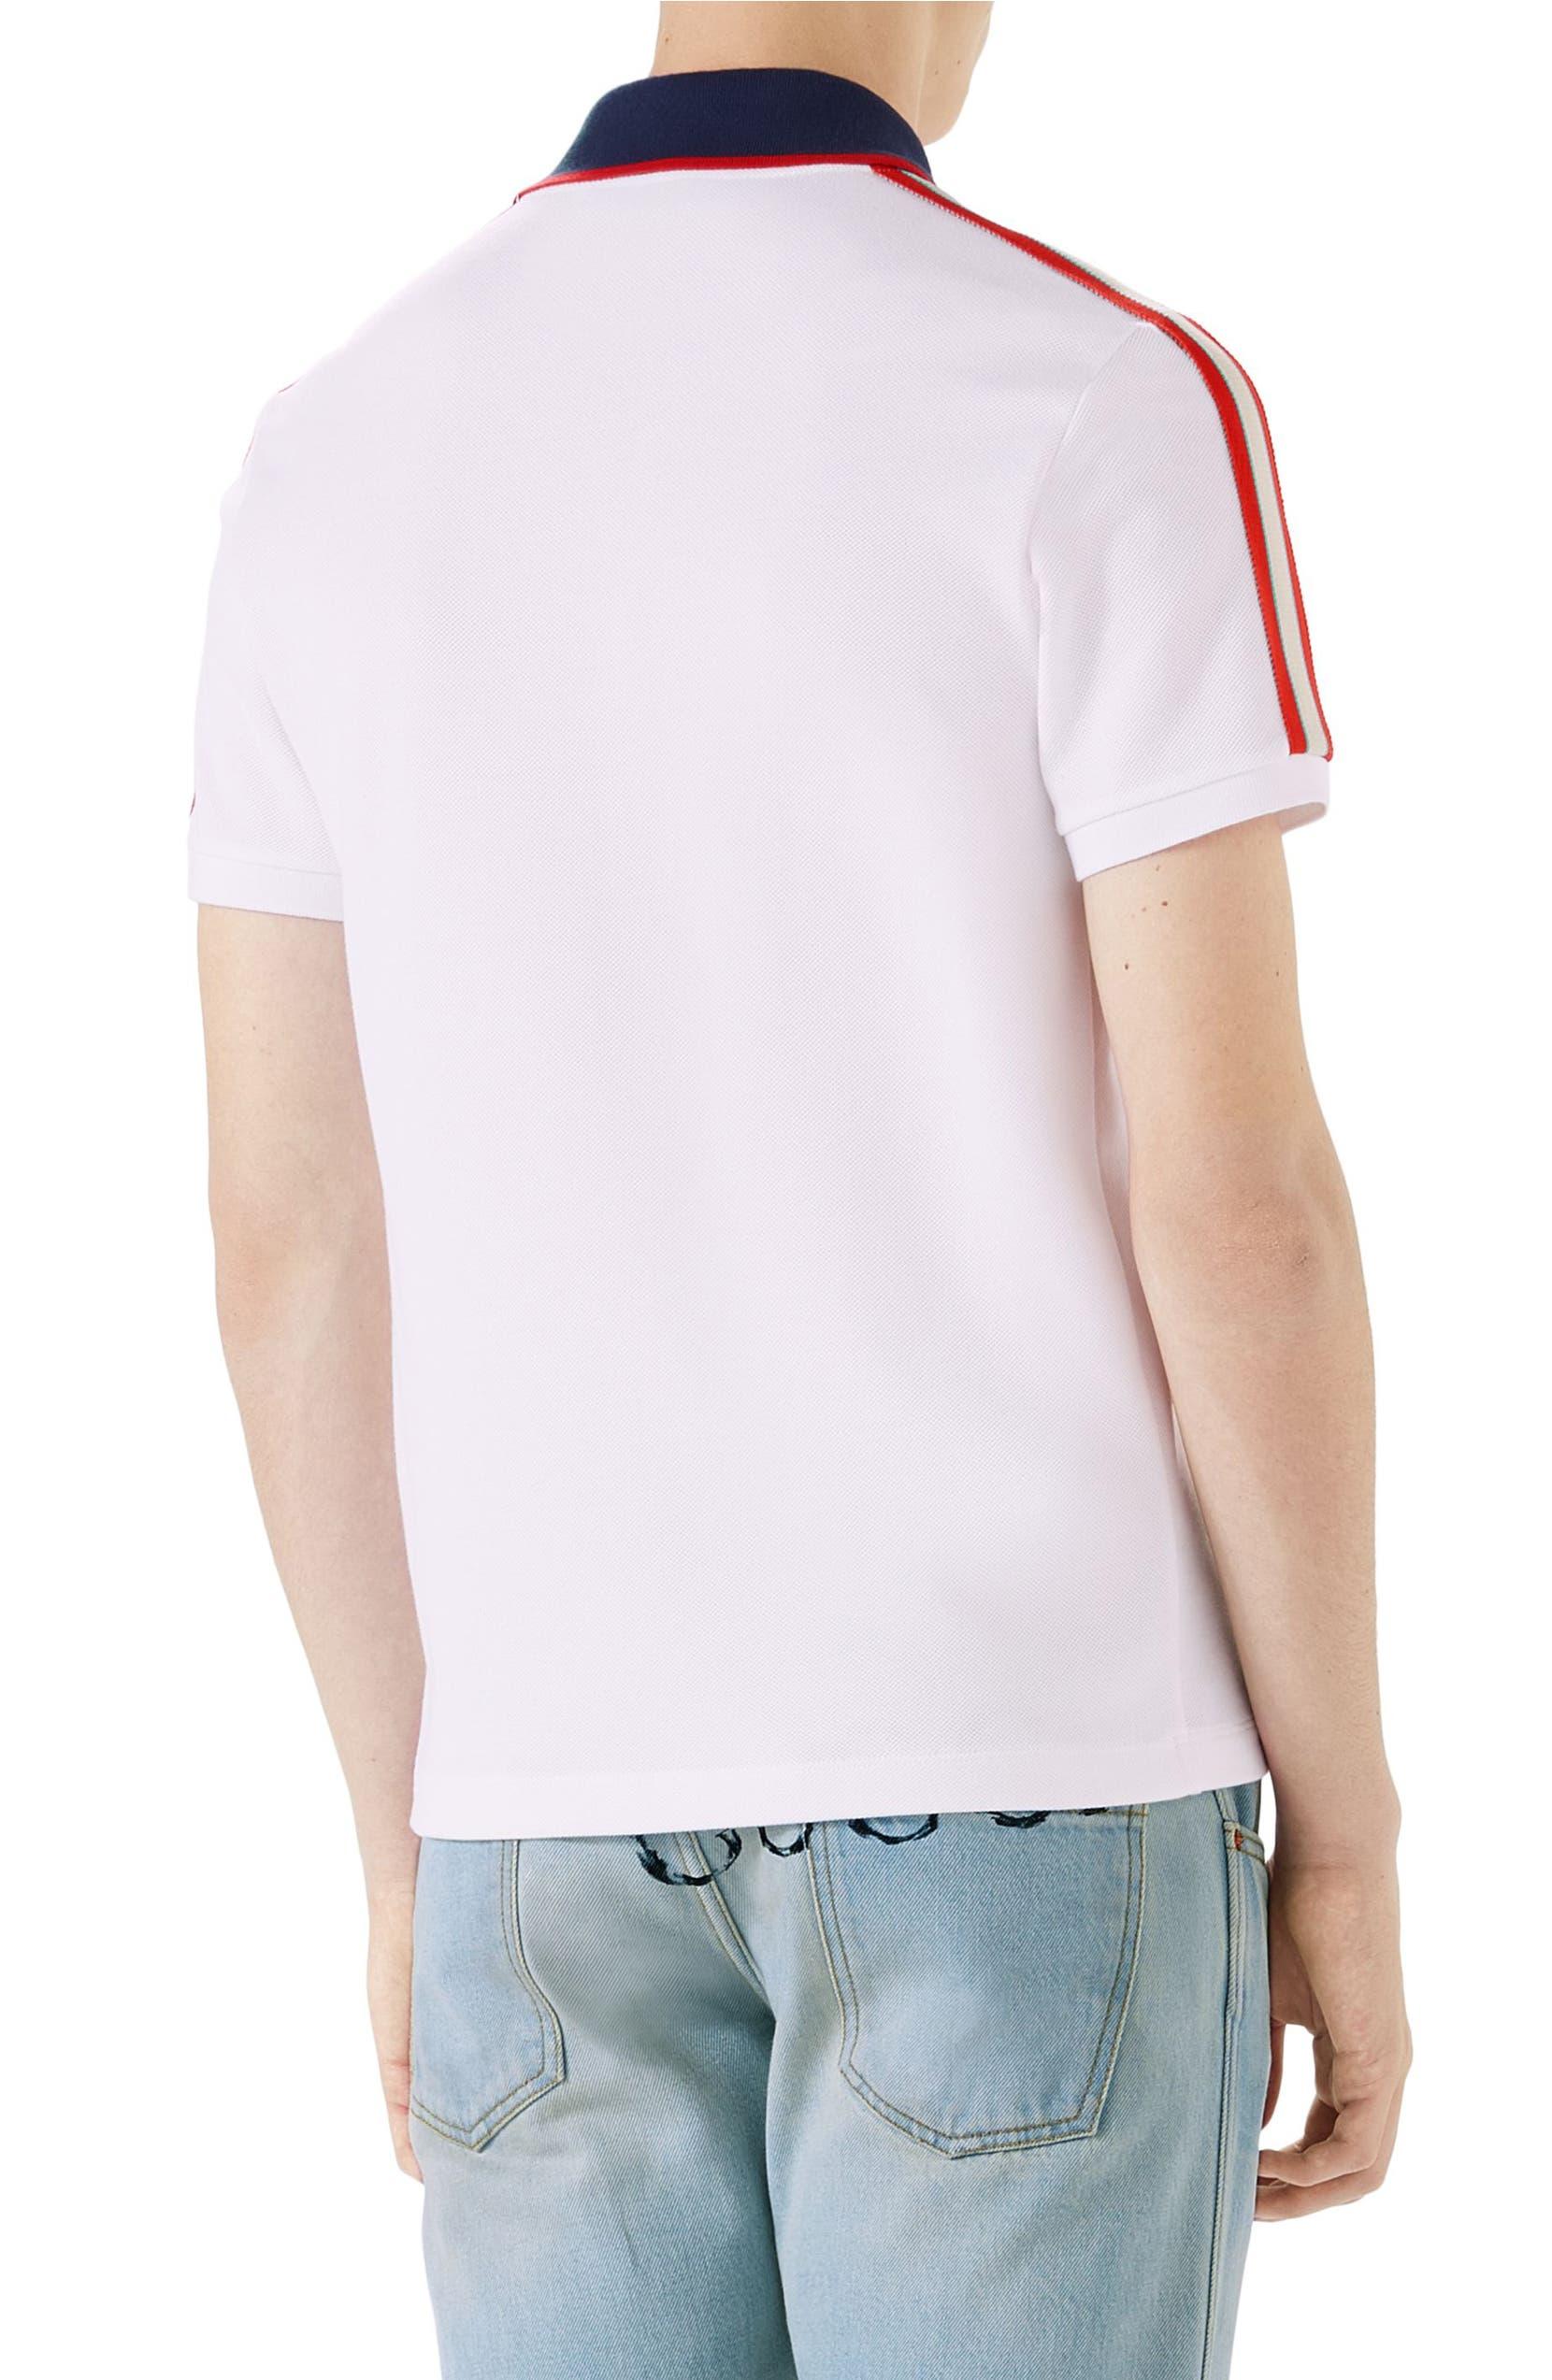 6846fefb1 Gucci Jacquard Stripe Sleeve Piqué Polo